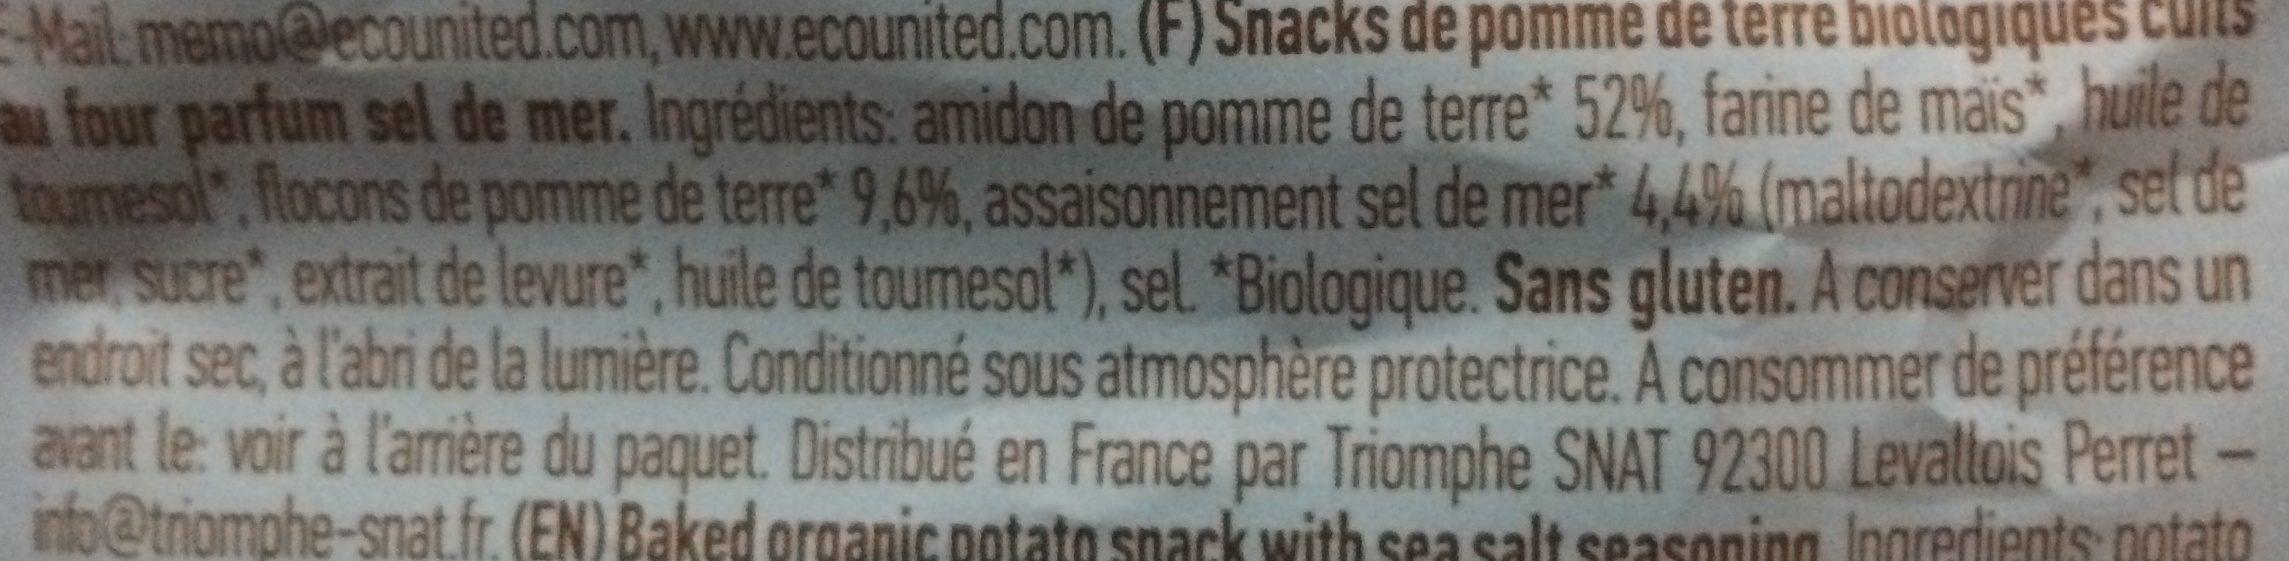 Organique Potato Snack With Sea Salt 85G - Ingredienti - fr